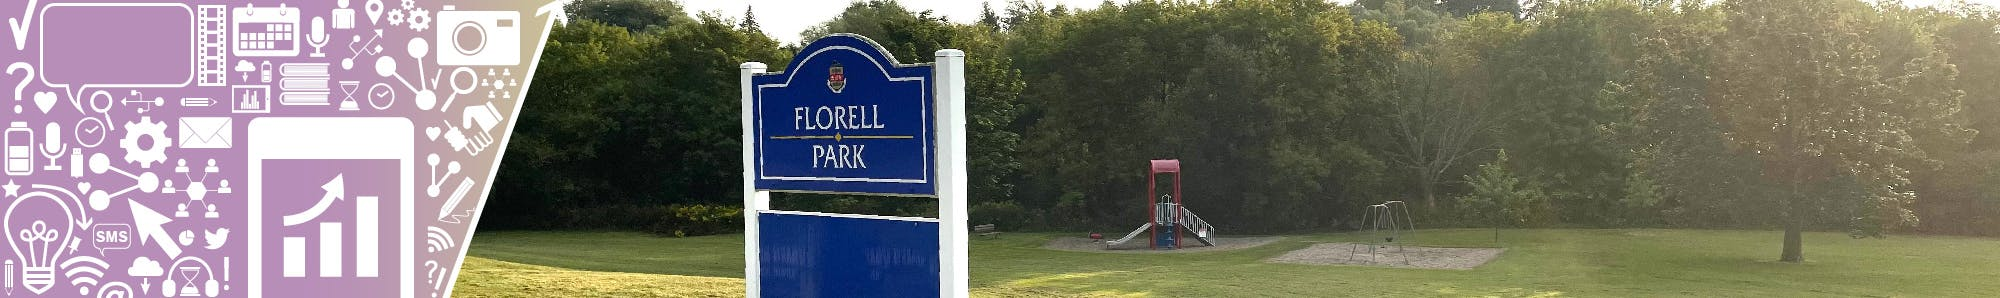 Florell Drive Park Redevelopment